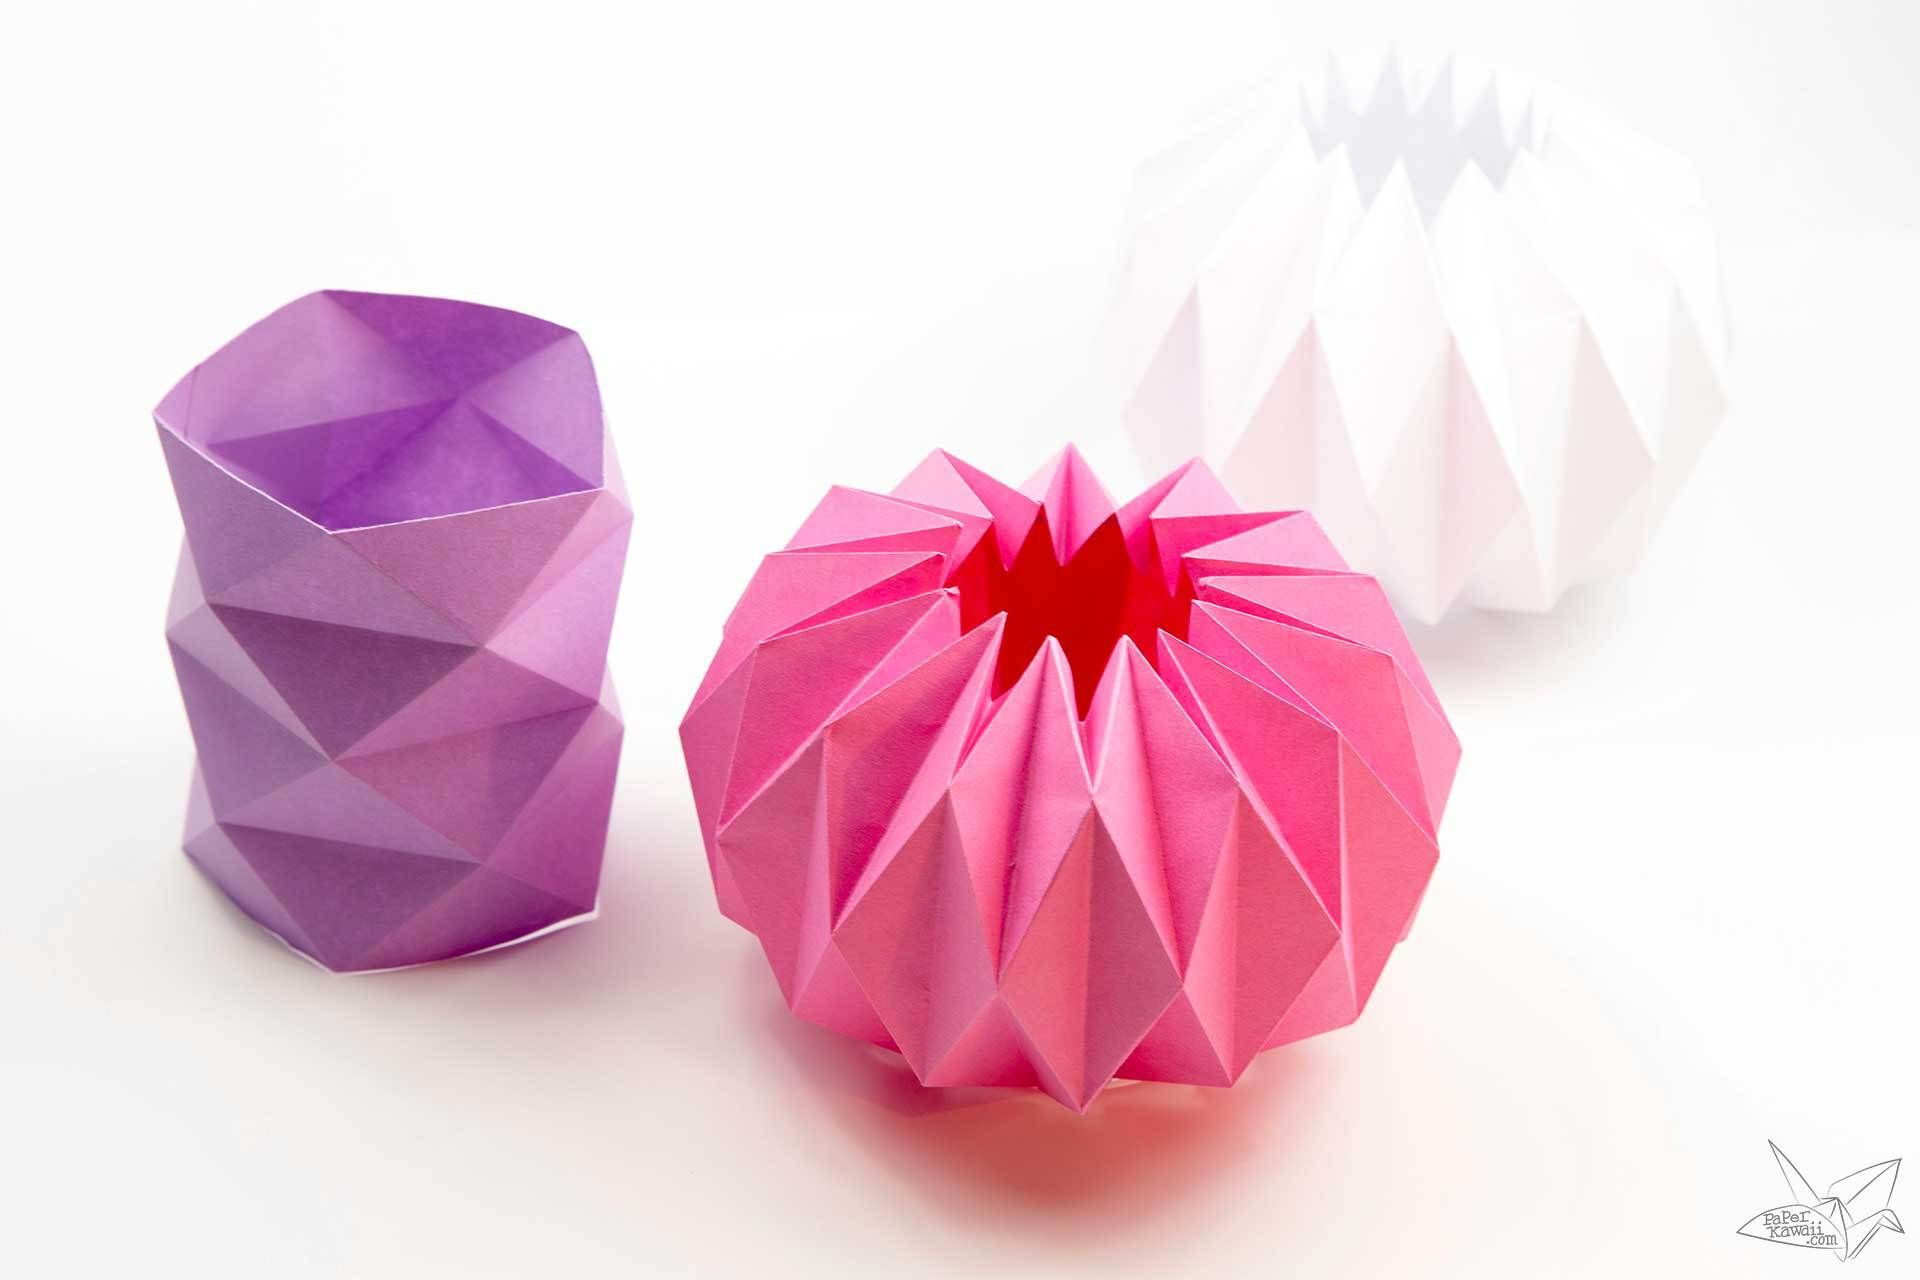 Origami tetrahedron 3 sided pyramid tutorial origami origami tetrahedron 3 sided pyramid tutorial sciox Gallery